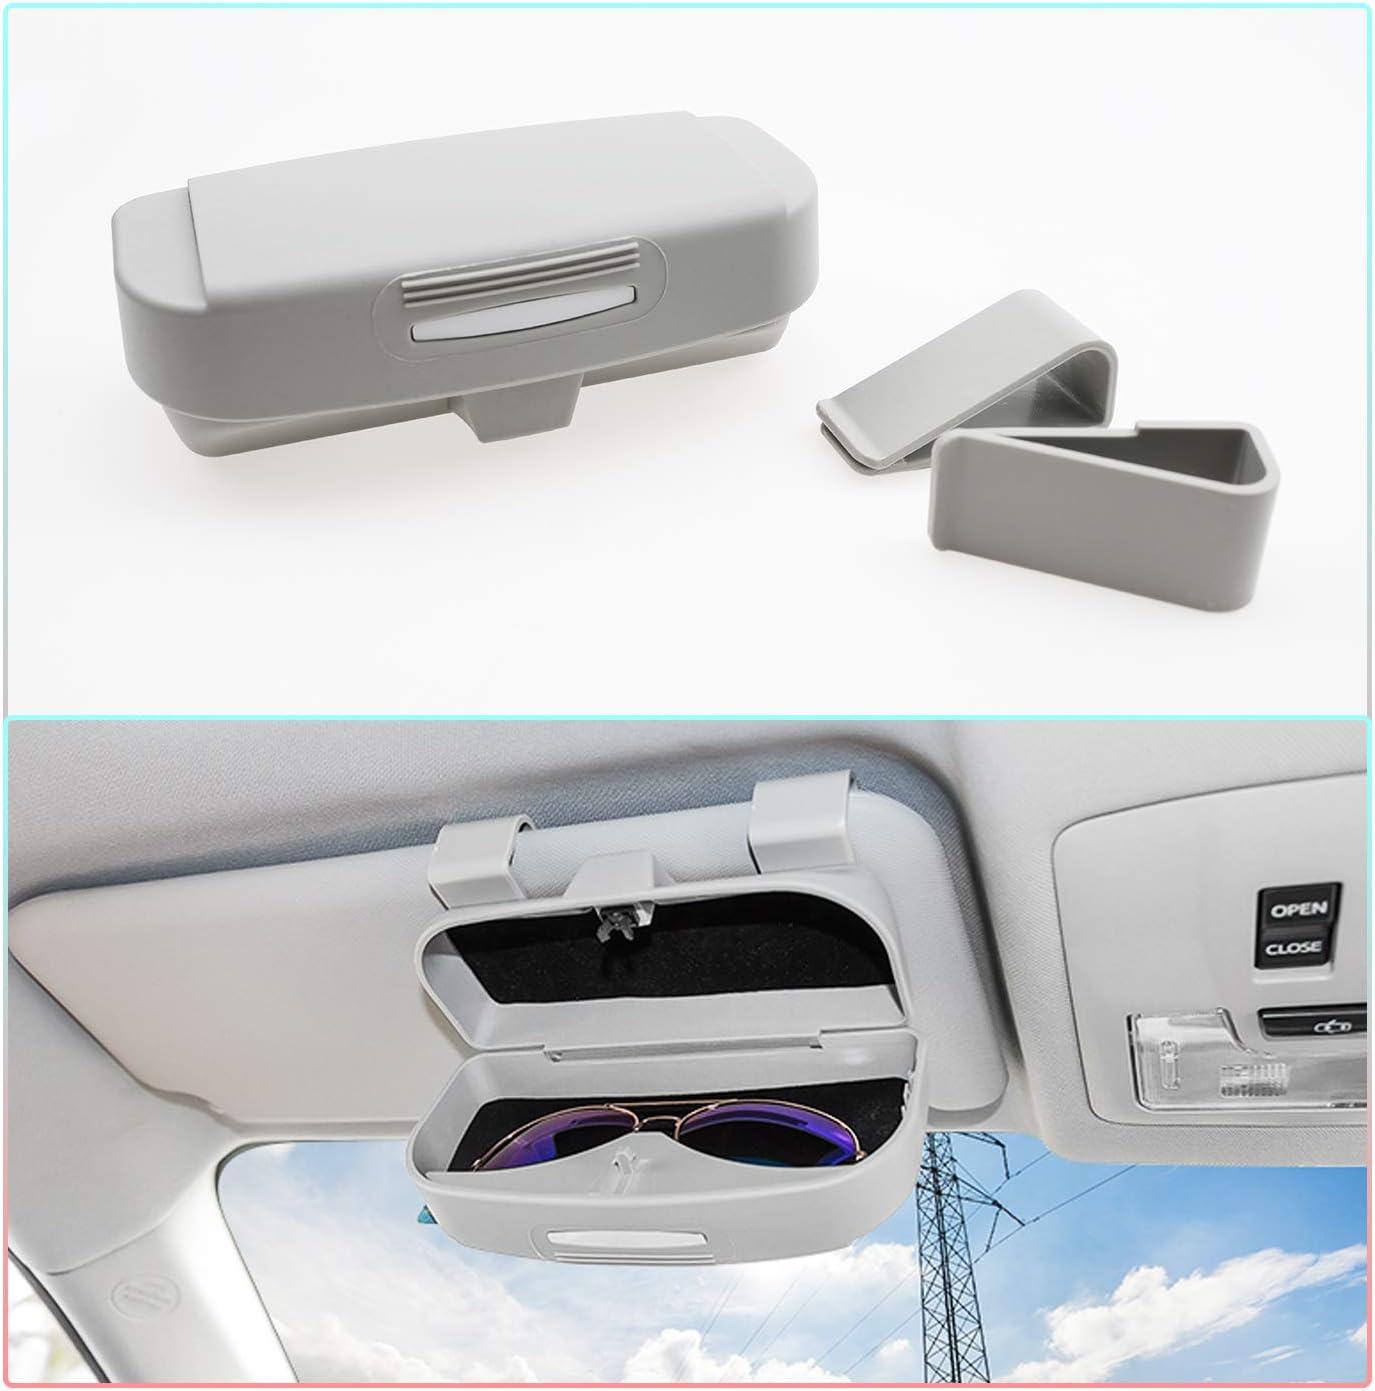 LFOTPP Car Sunglasses Sun Glass Holder Case Eyeglasses Storage Box for 2018 Beige A Style CRV CR-V,/Interior Accessories Autos Parts